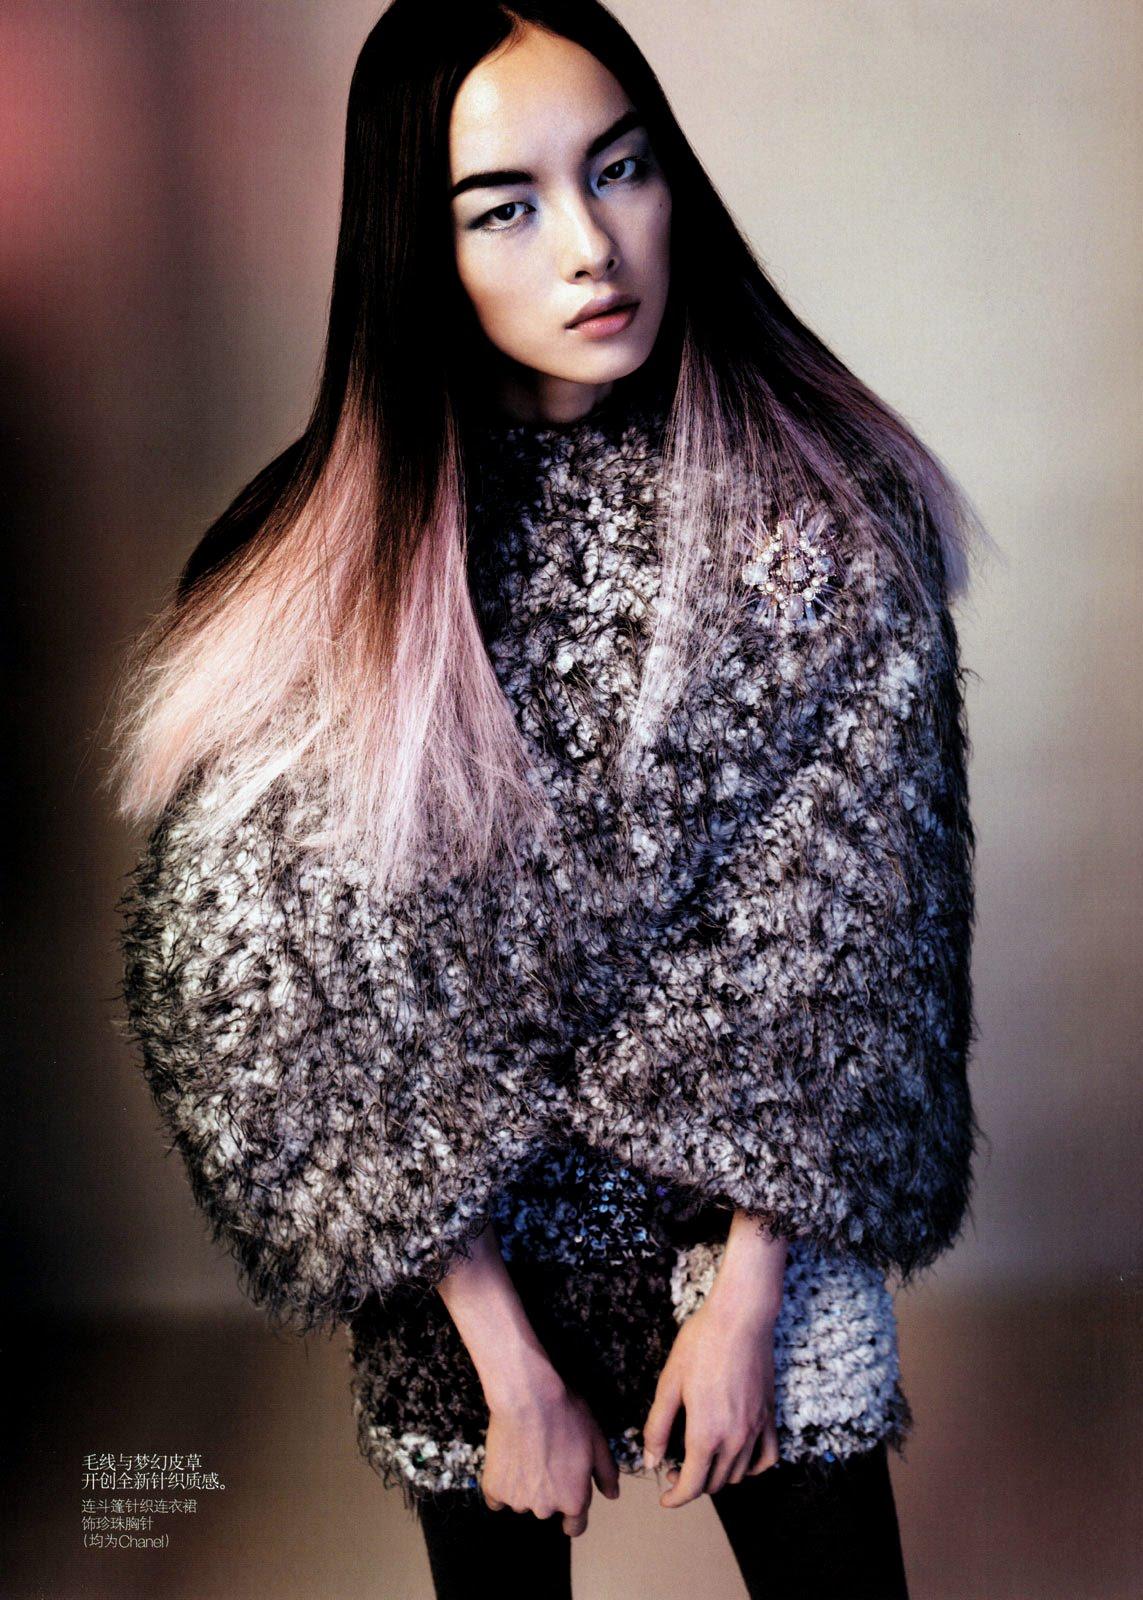 ASIAN MODELS BLOG: Han Jin Editorial for Vogue Korea